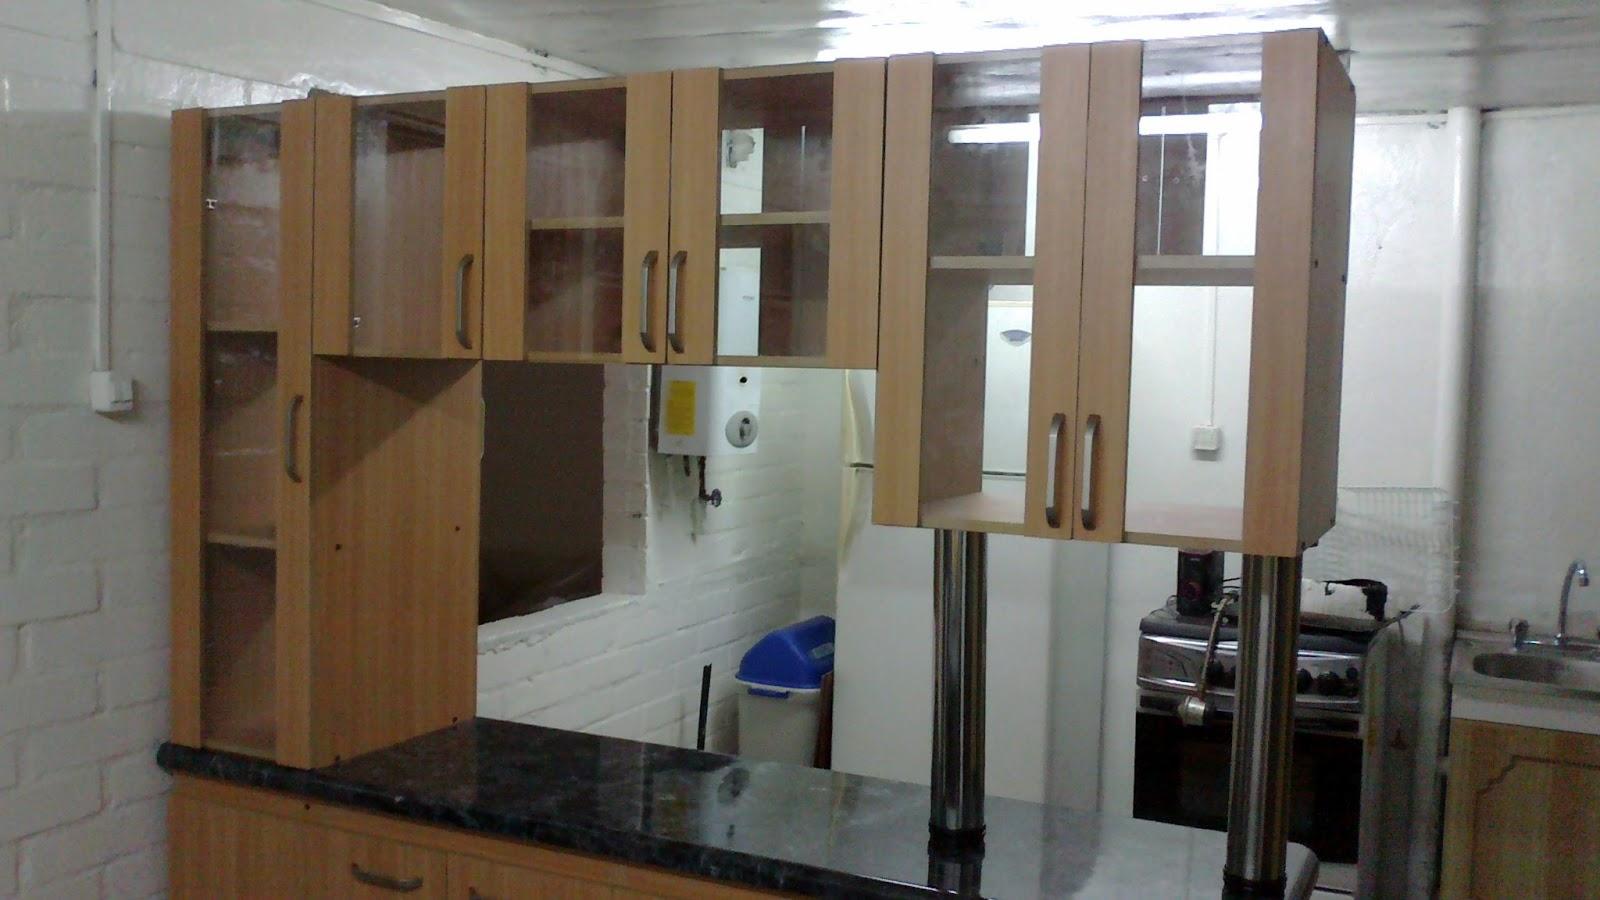 Silva e hijos mueble cocina americana - Mueble persiana cocina ...